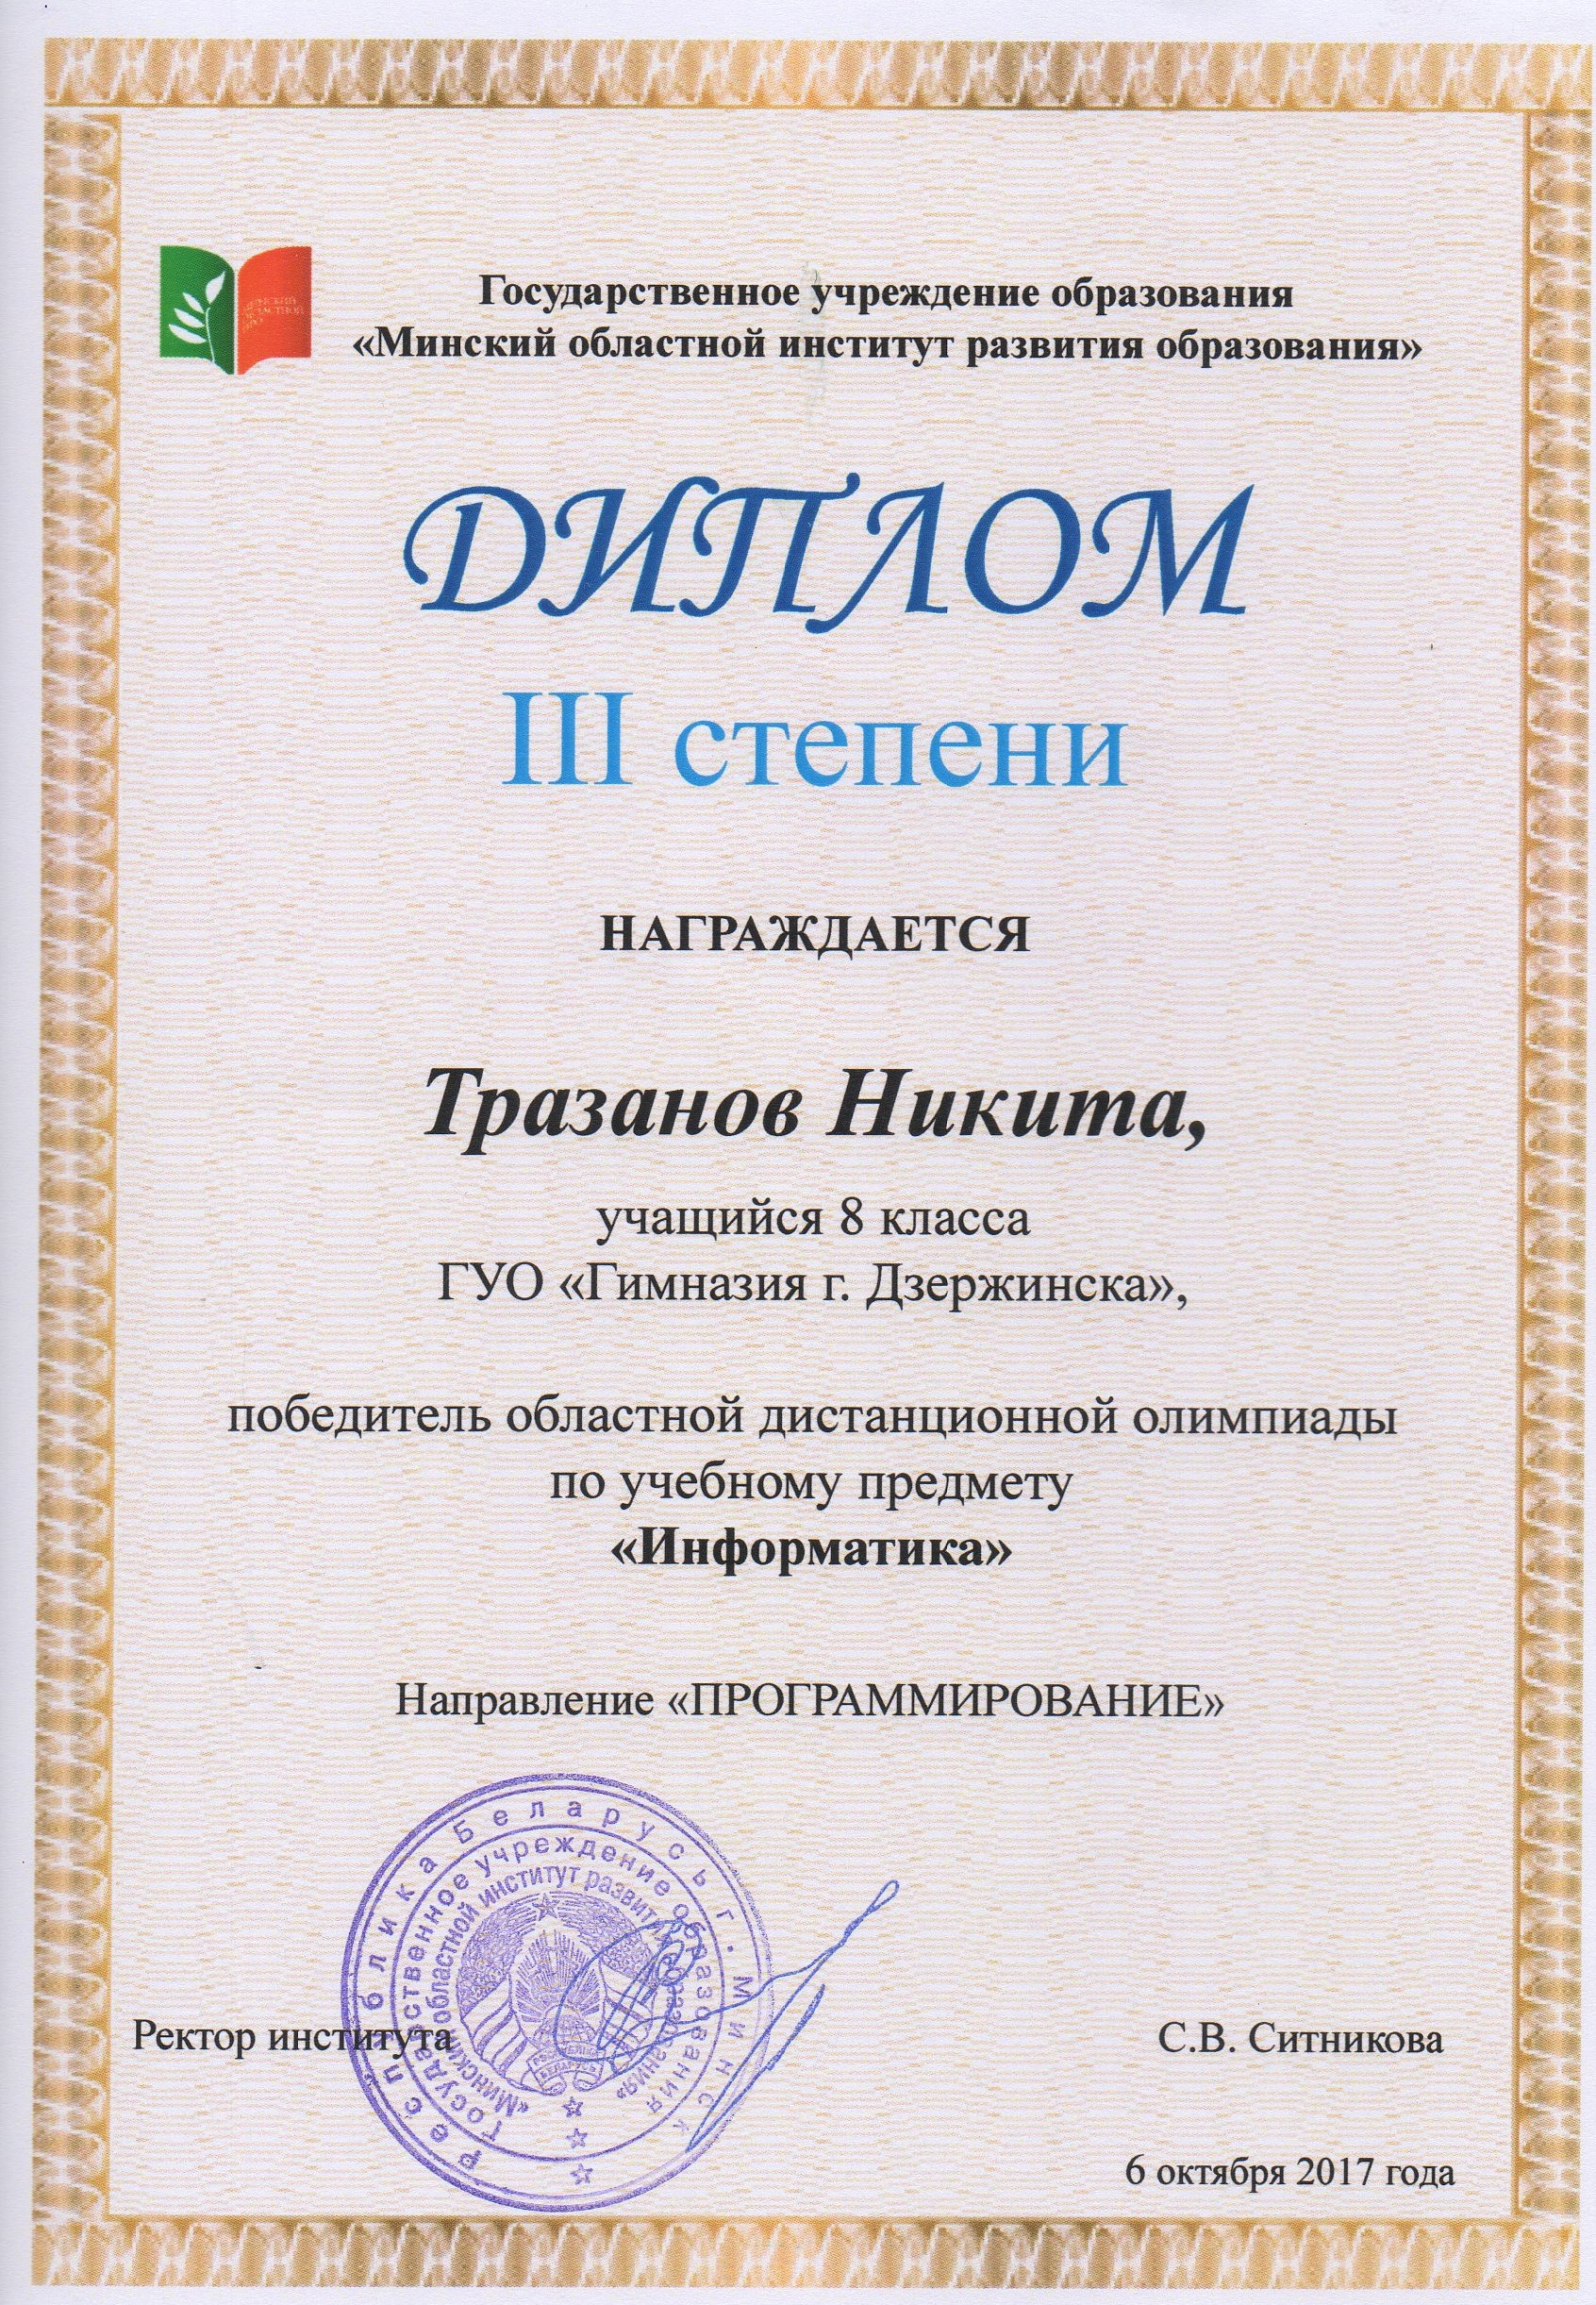 img139-2